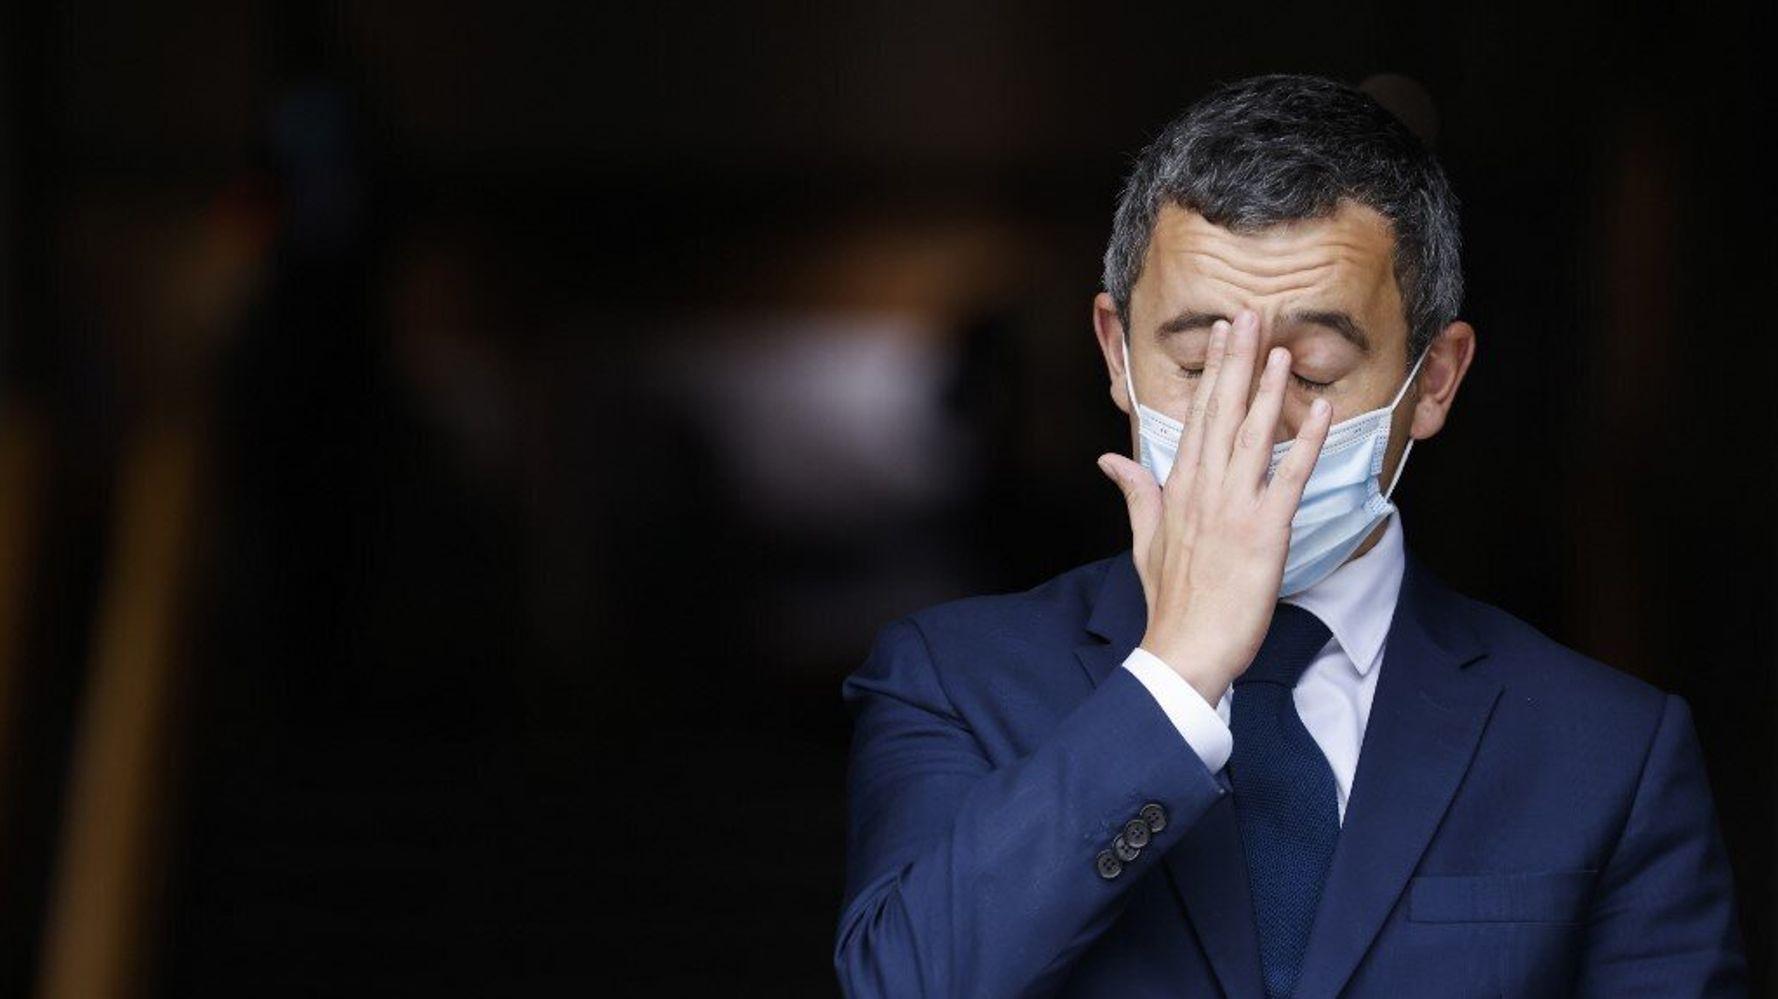 Fils de policier agressé à Belfort: Darmanin s'est-il emballé?